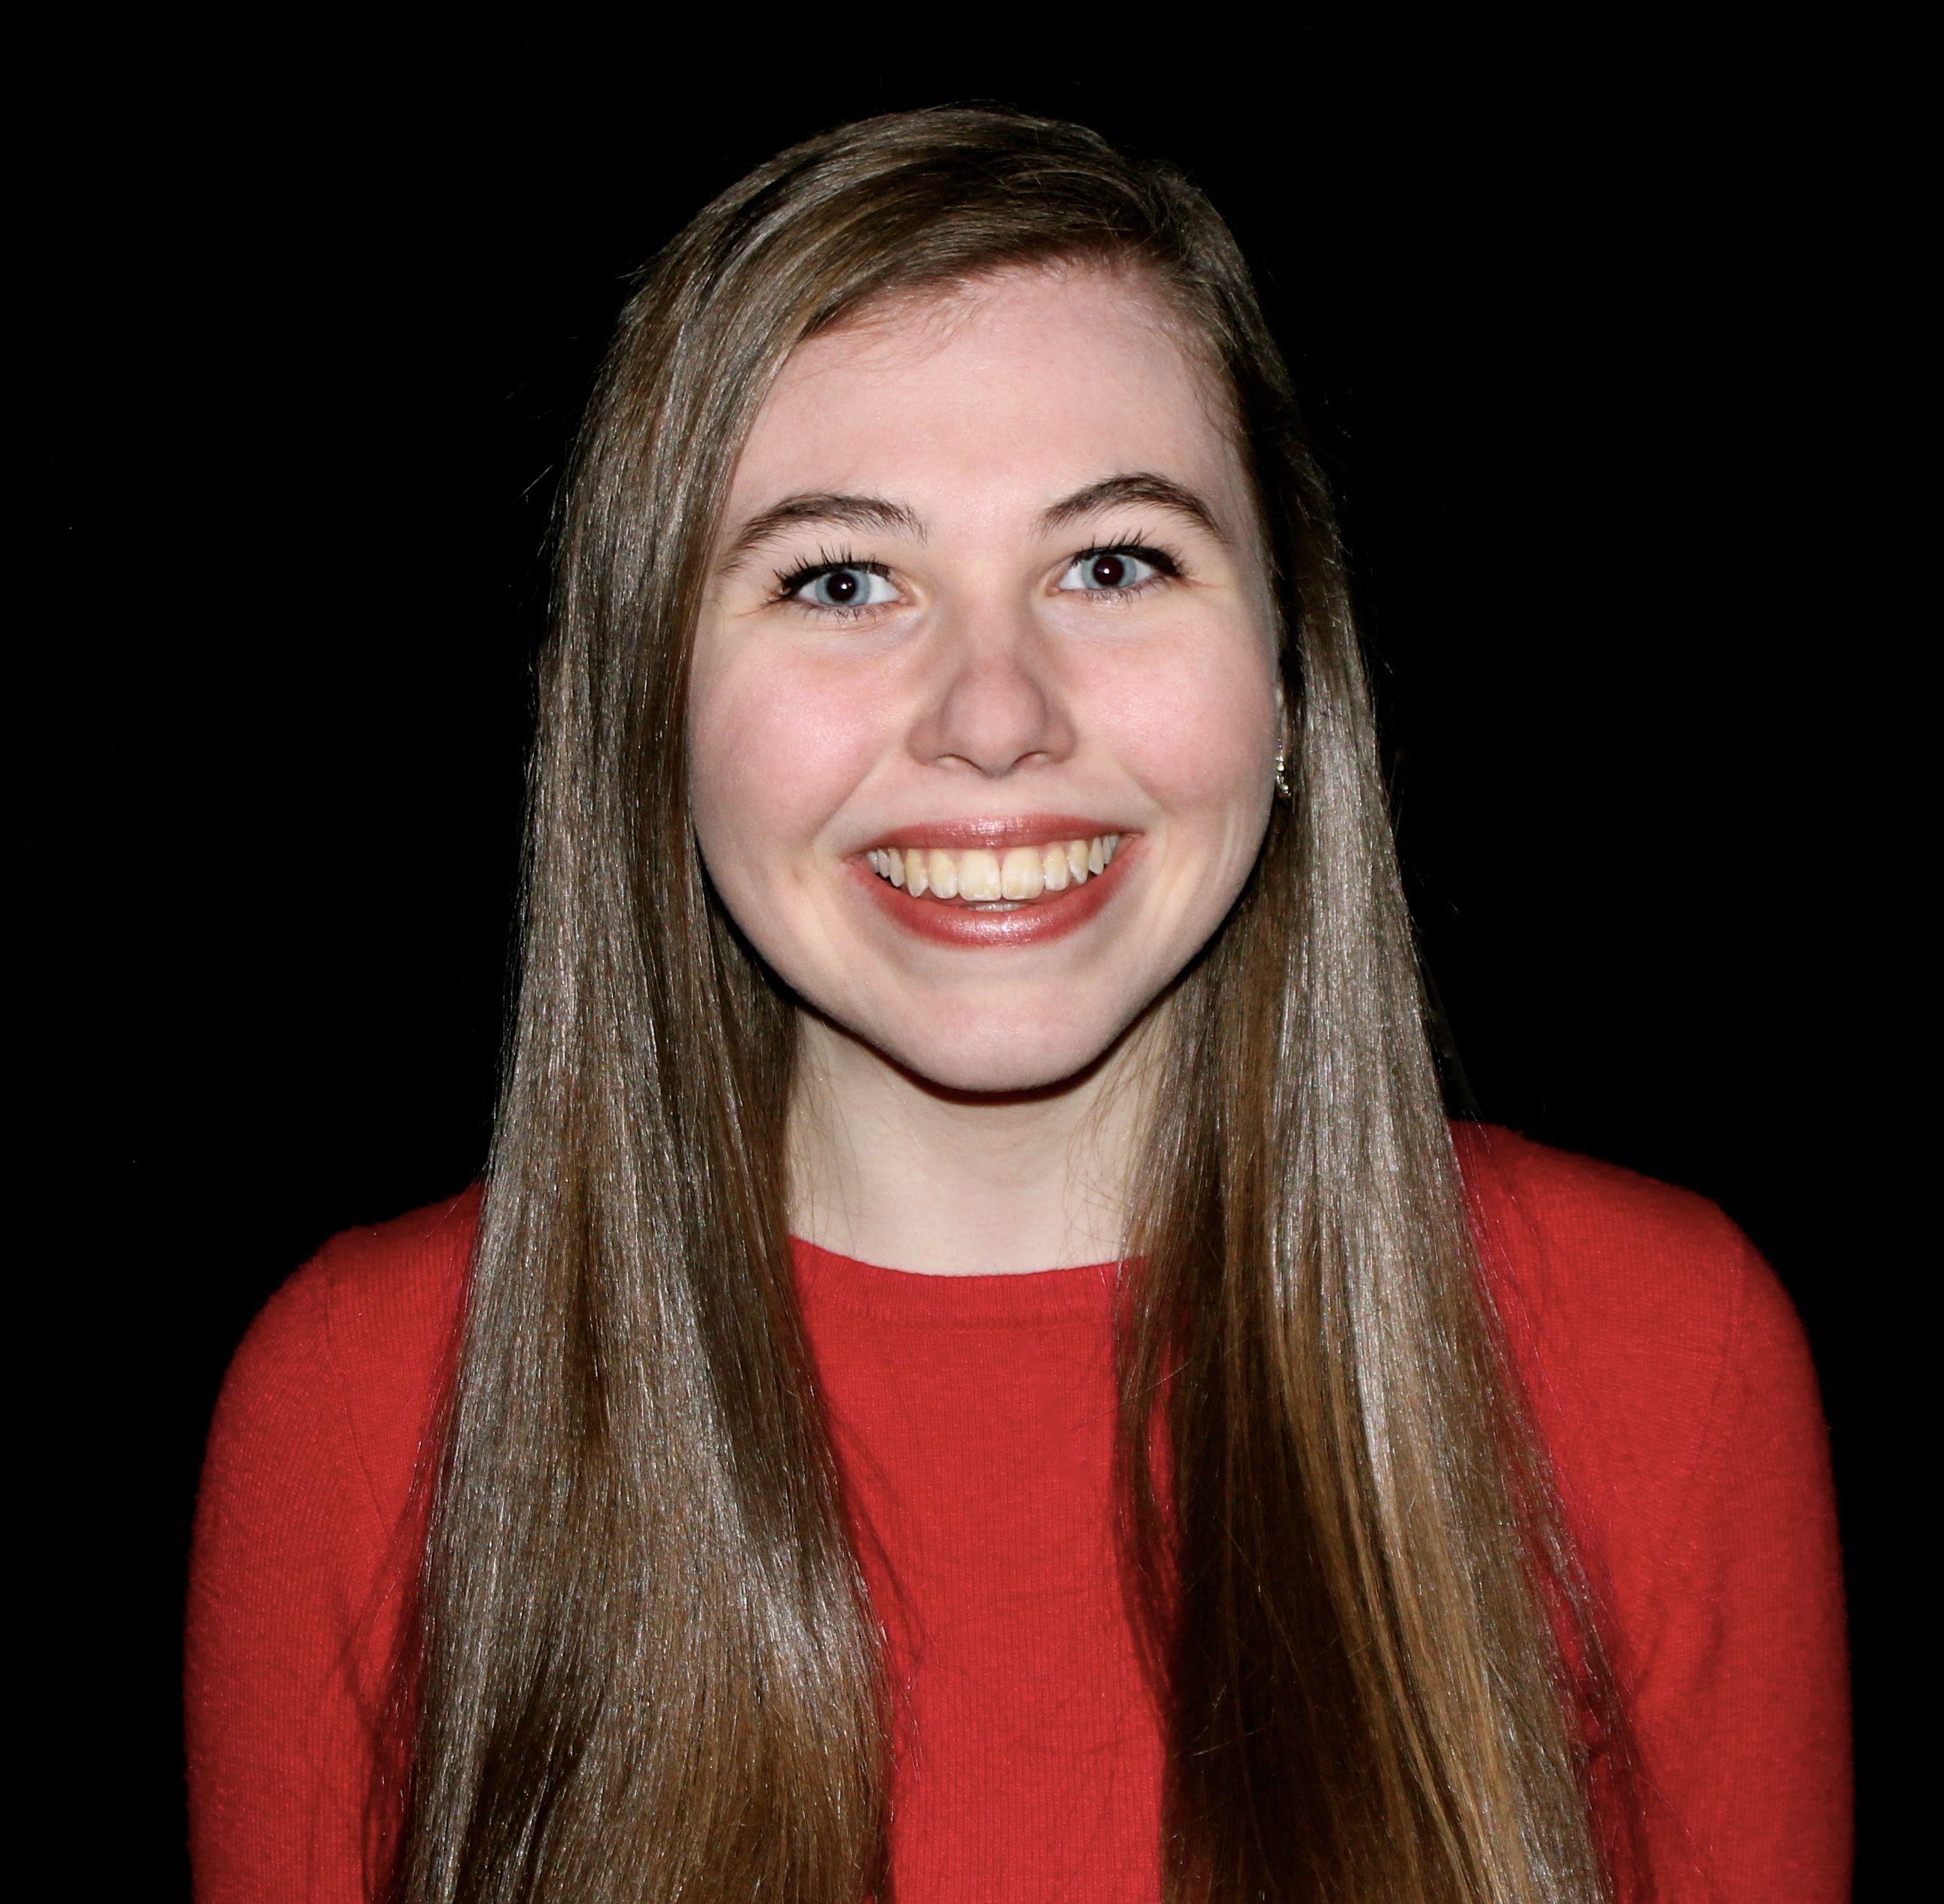 Amanda Atkinson